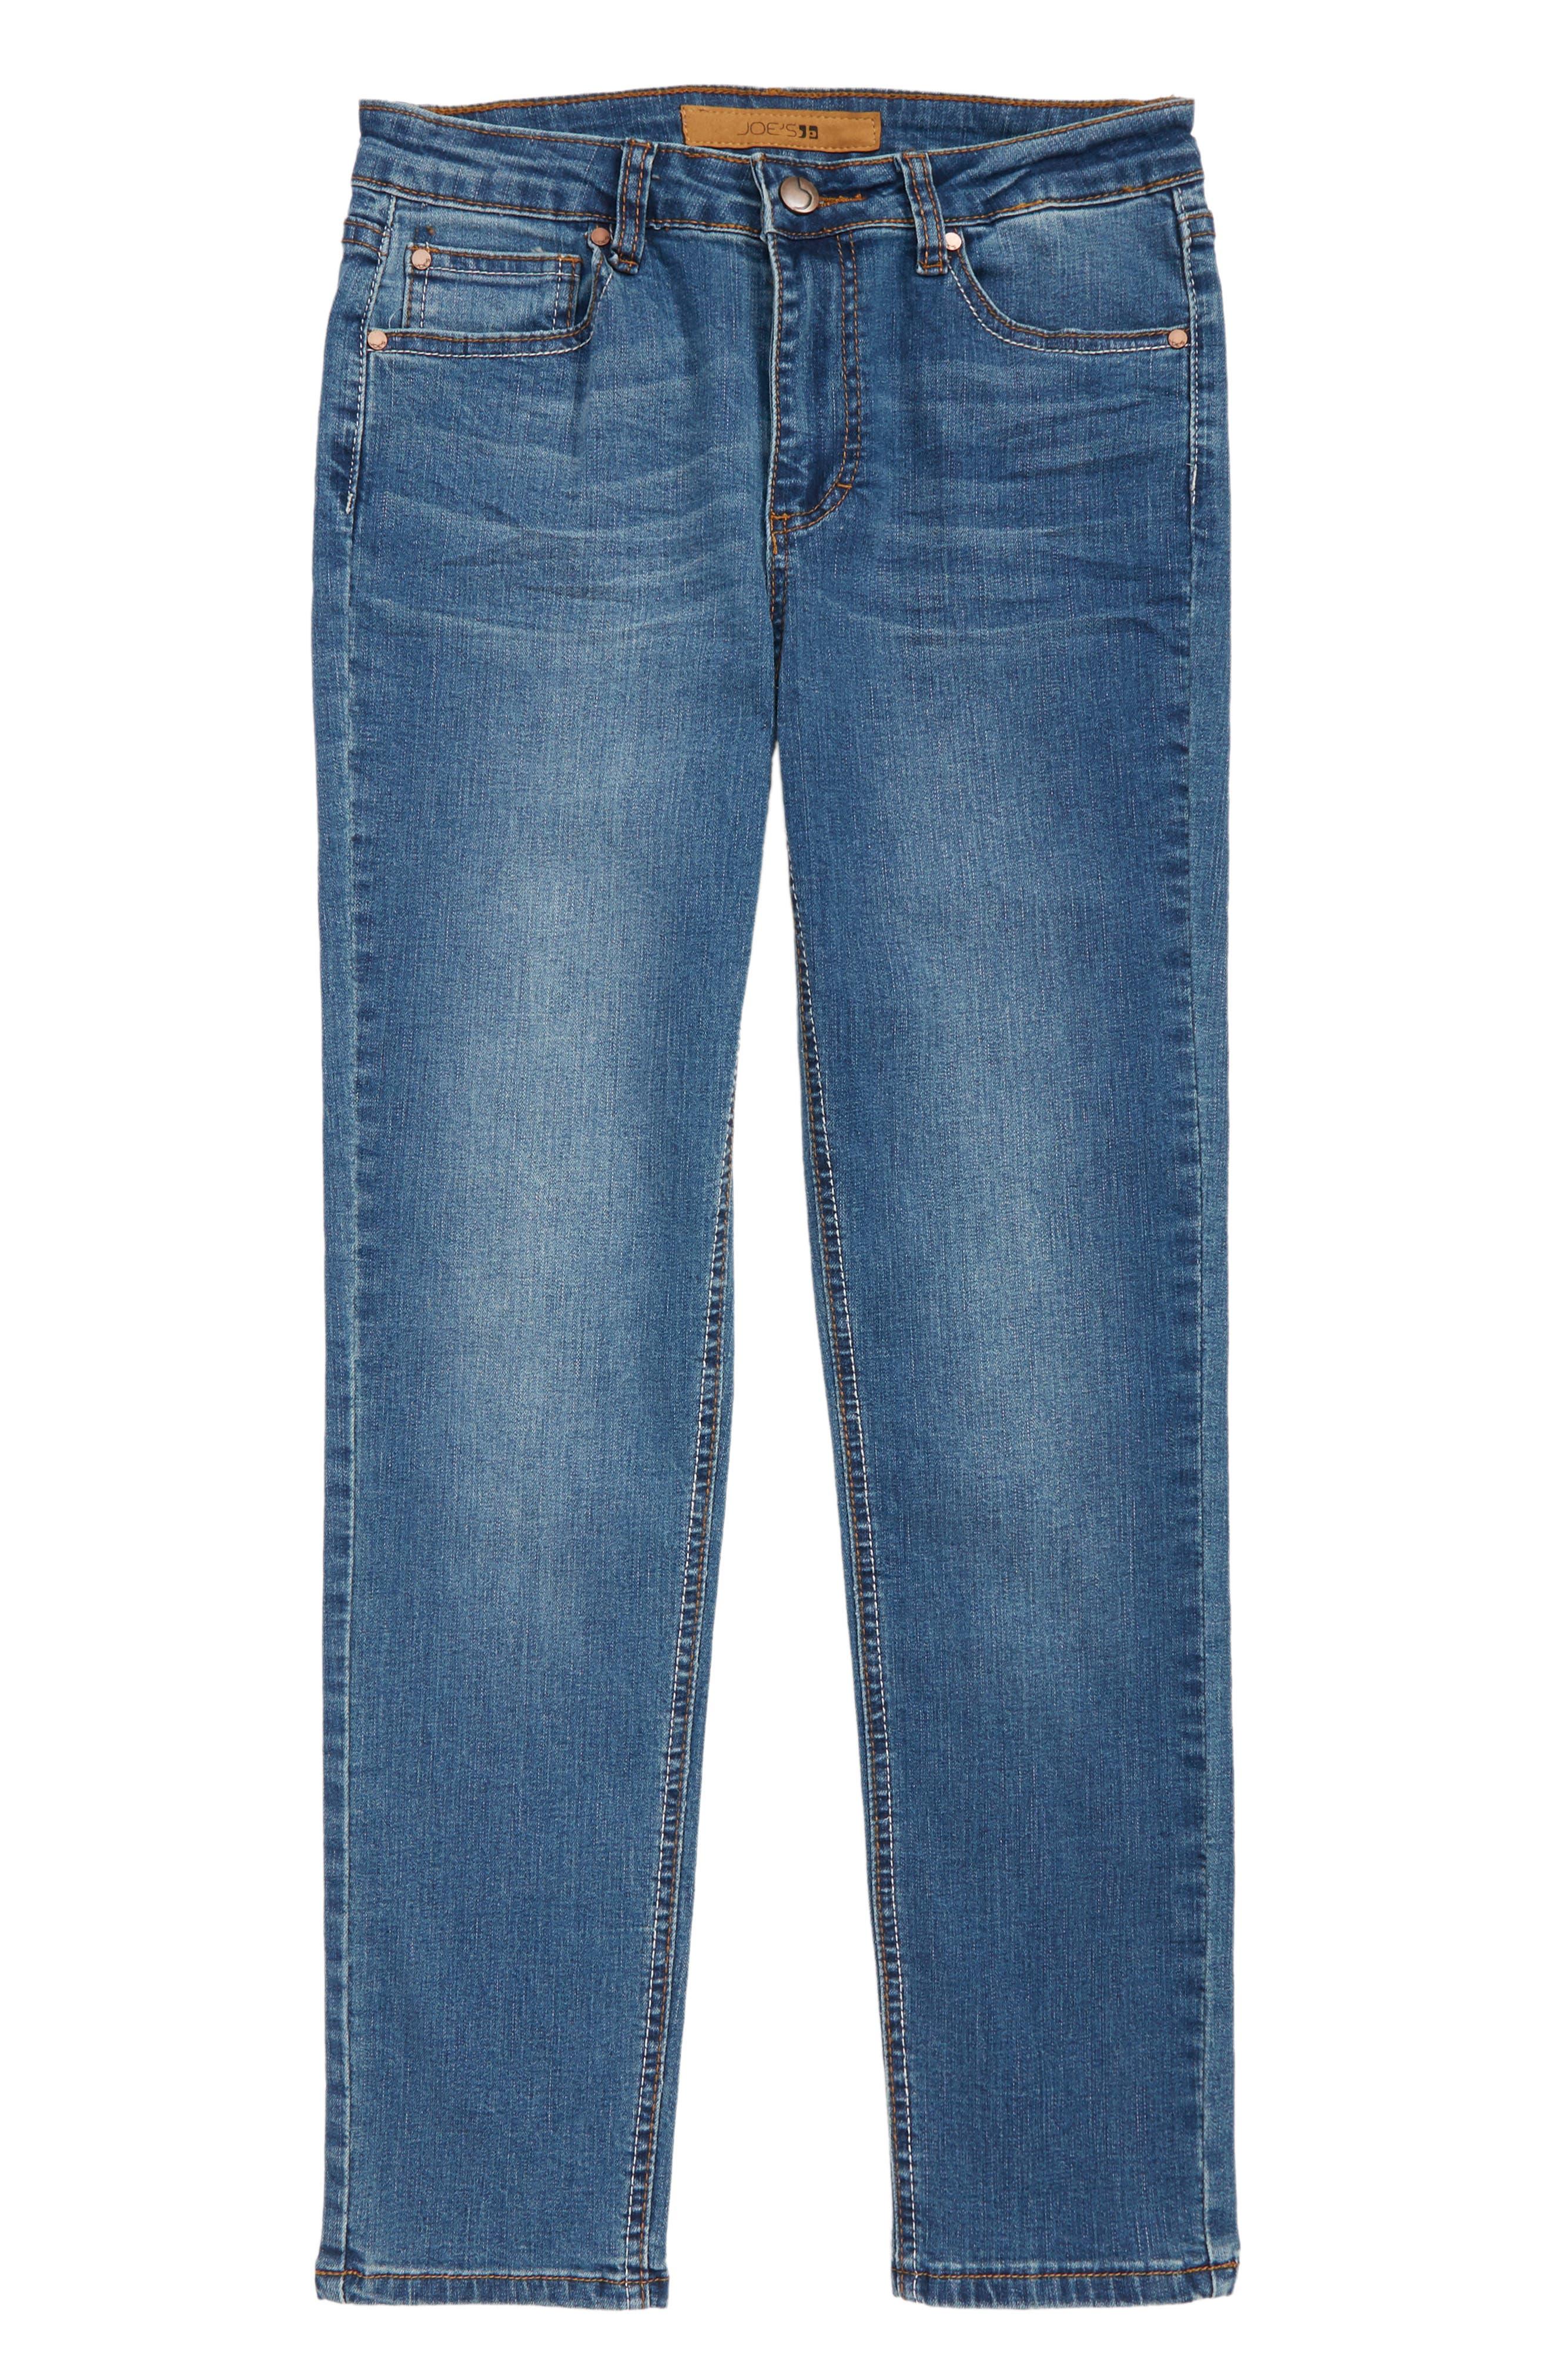 Brixton Stretch Jeans,                         Main,                         color, DRESDEN BLUE